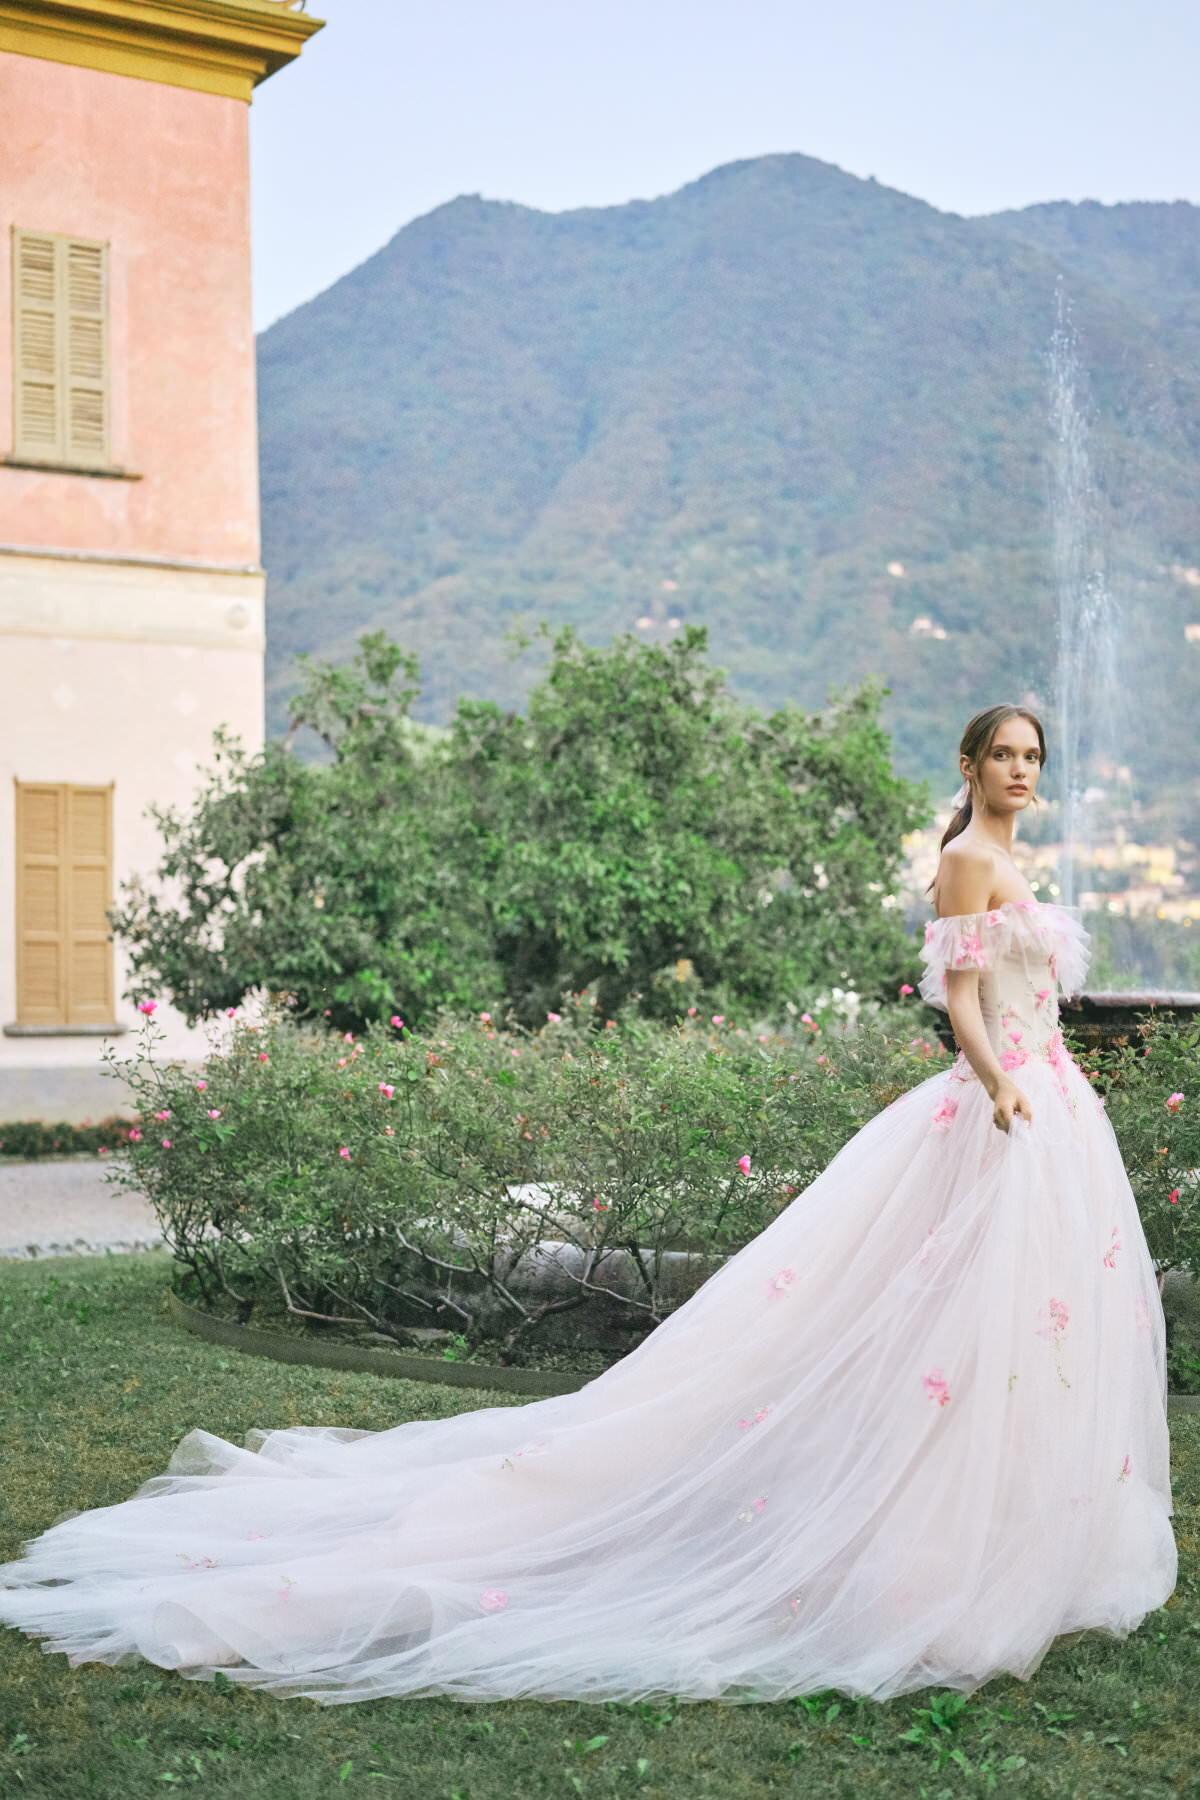 MoniqueLhuillier-Fall2020-Bridal-Look13-Tulip-ktmerry.jpg